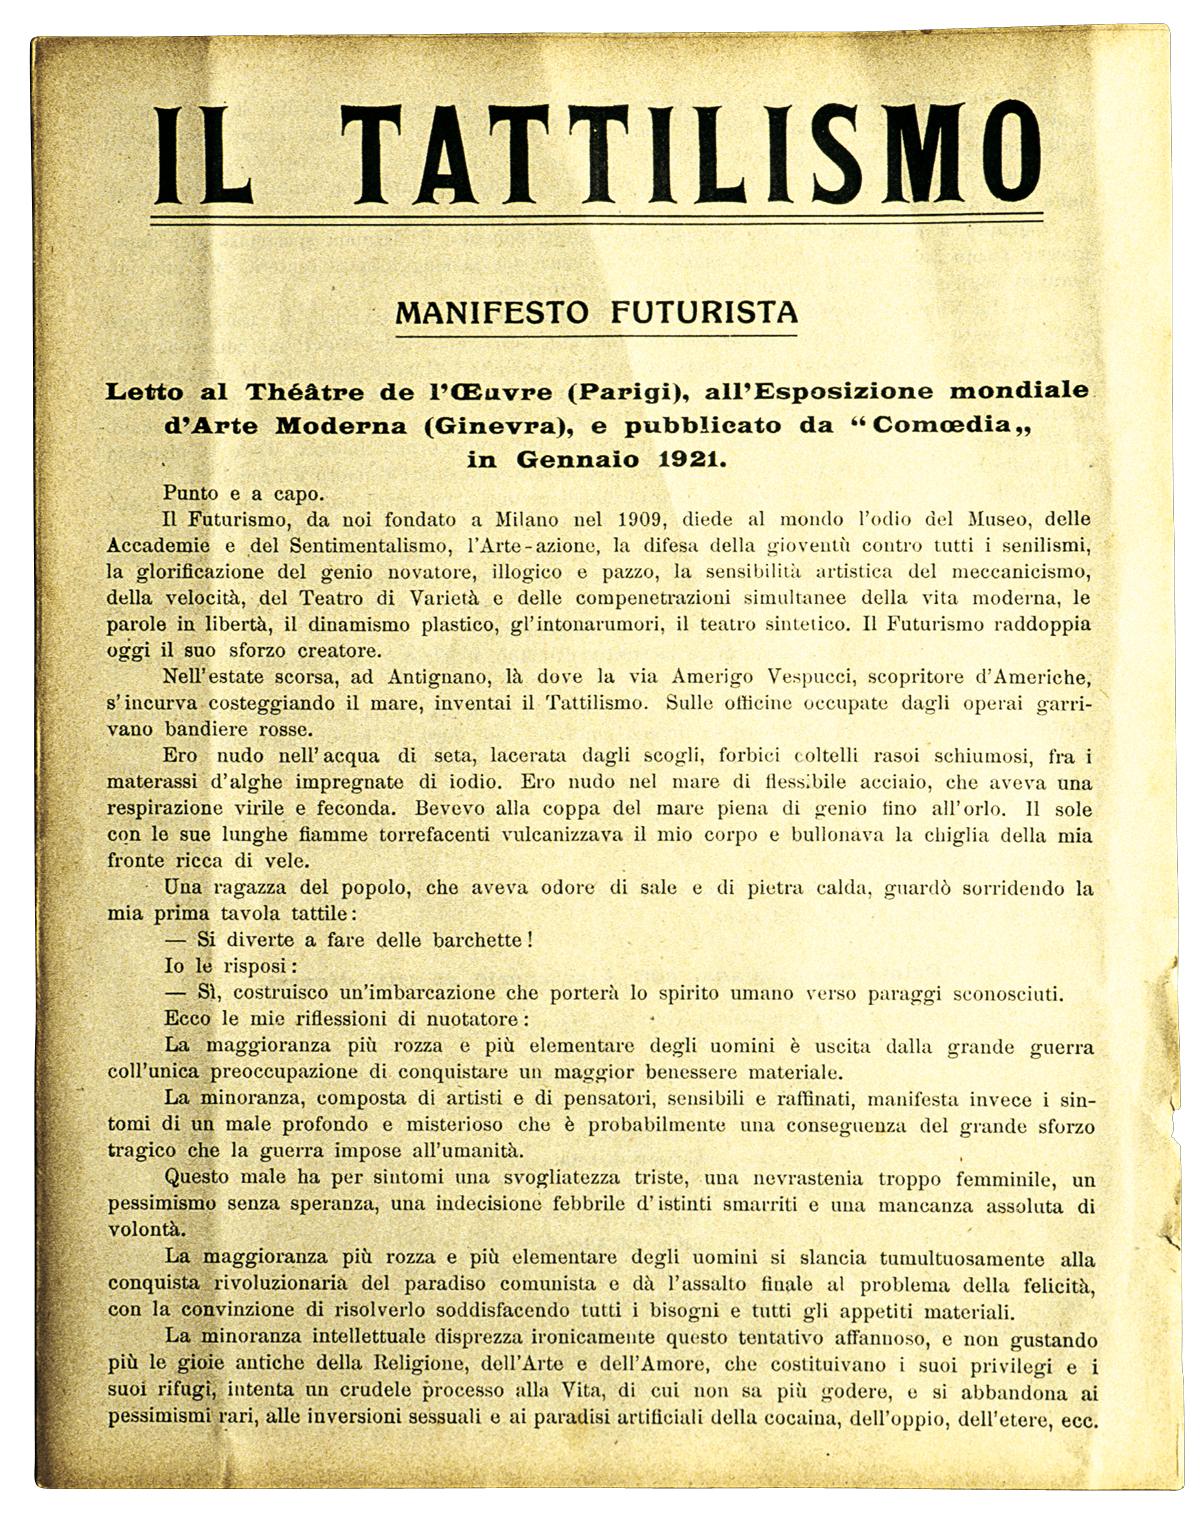 Manifesto futurista sul tattilismo